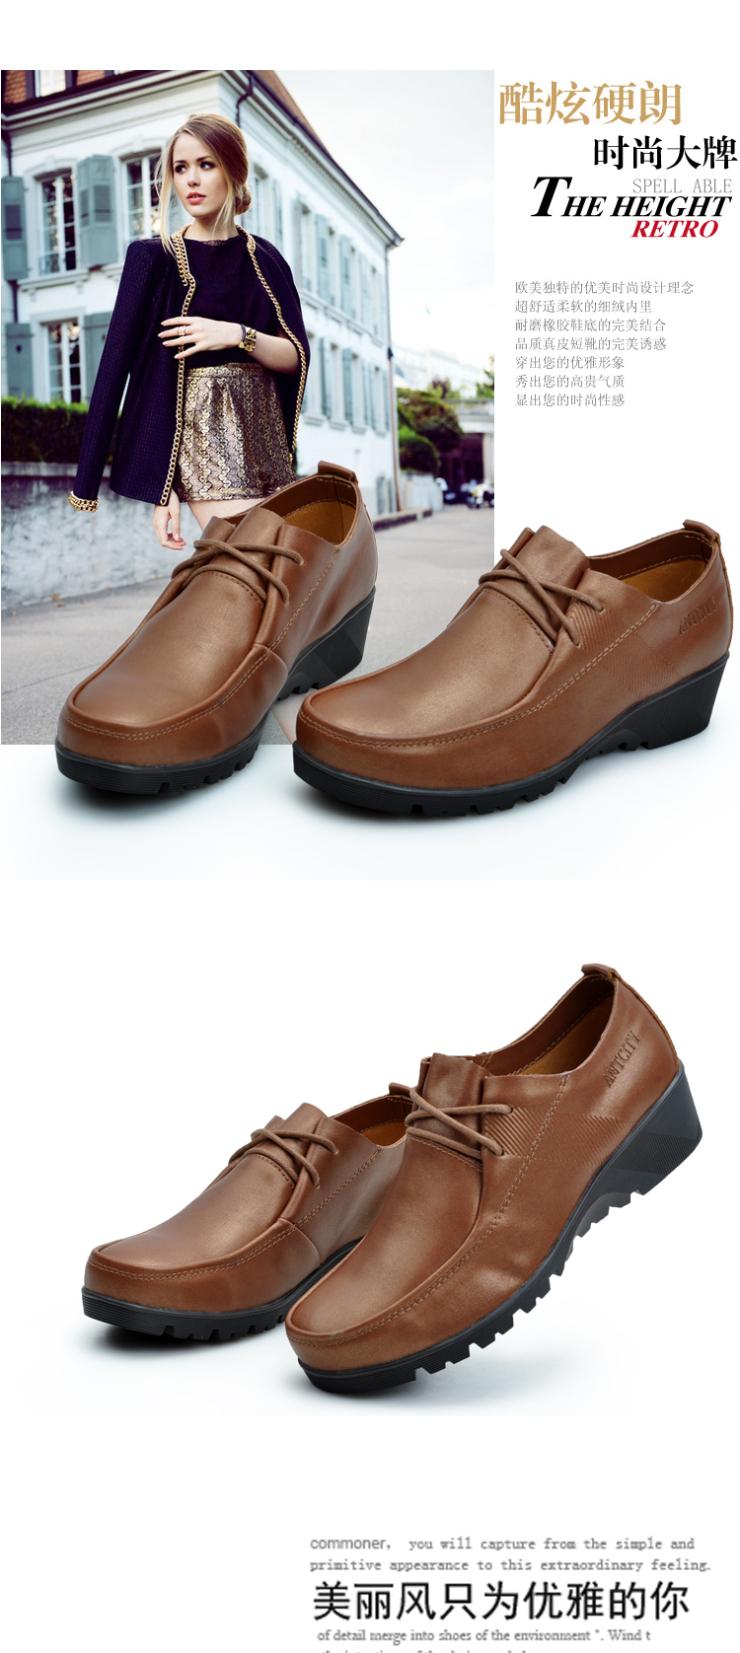 antcity/蚂蚁城女鞋真皮舒适圆头休闲皮鞋系带厚底